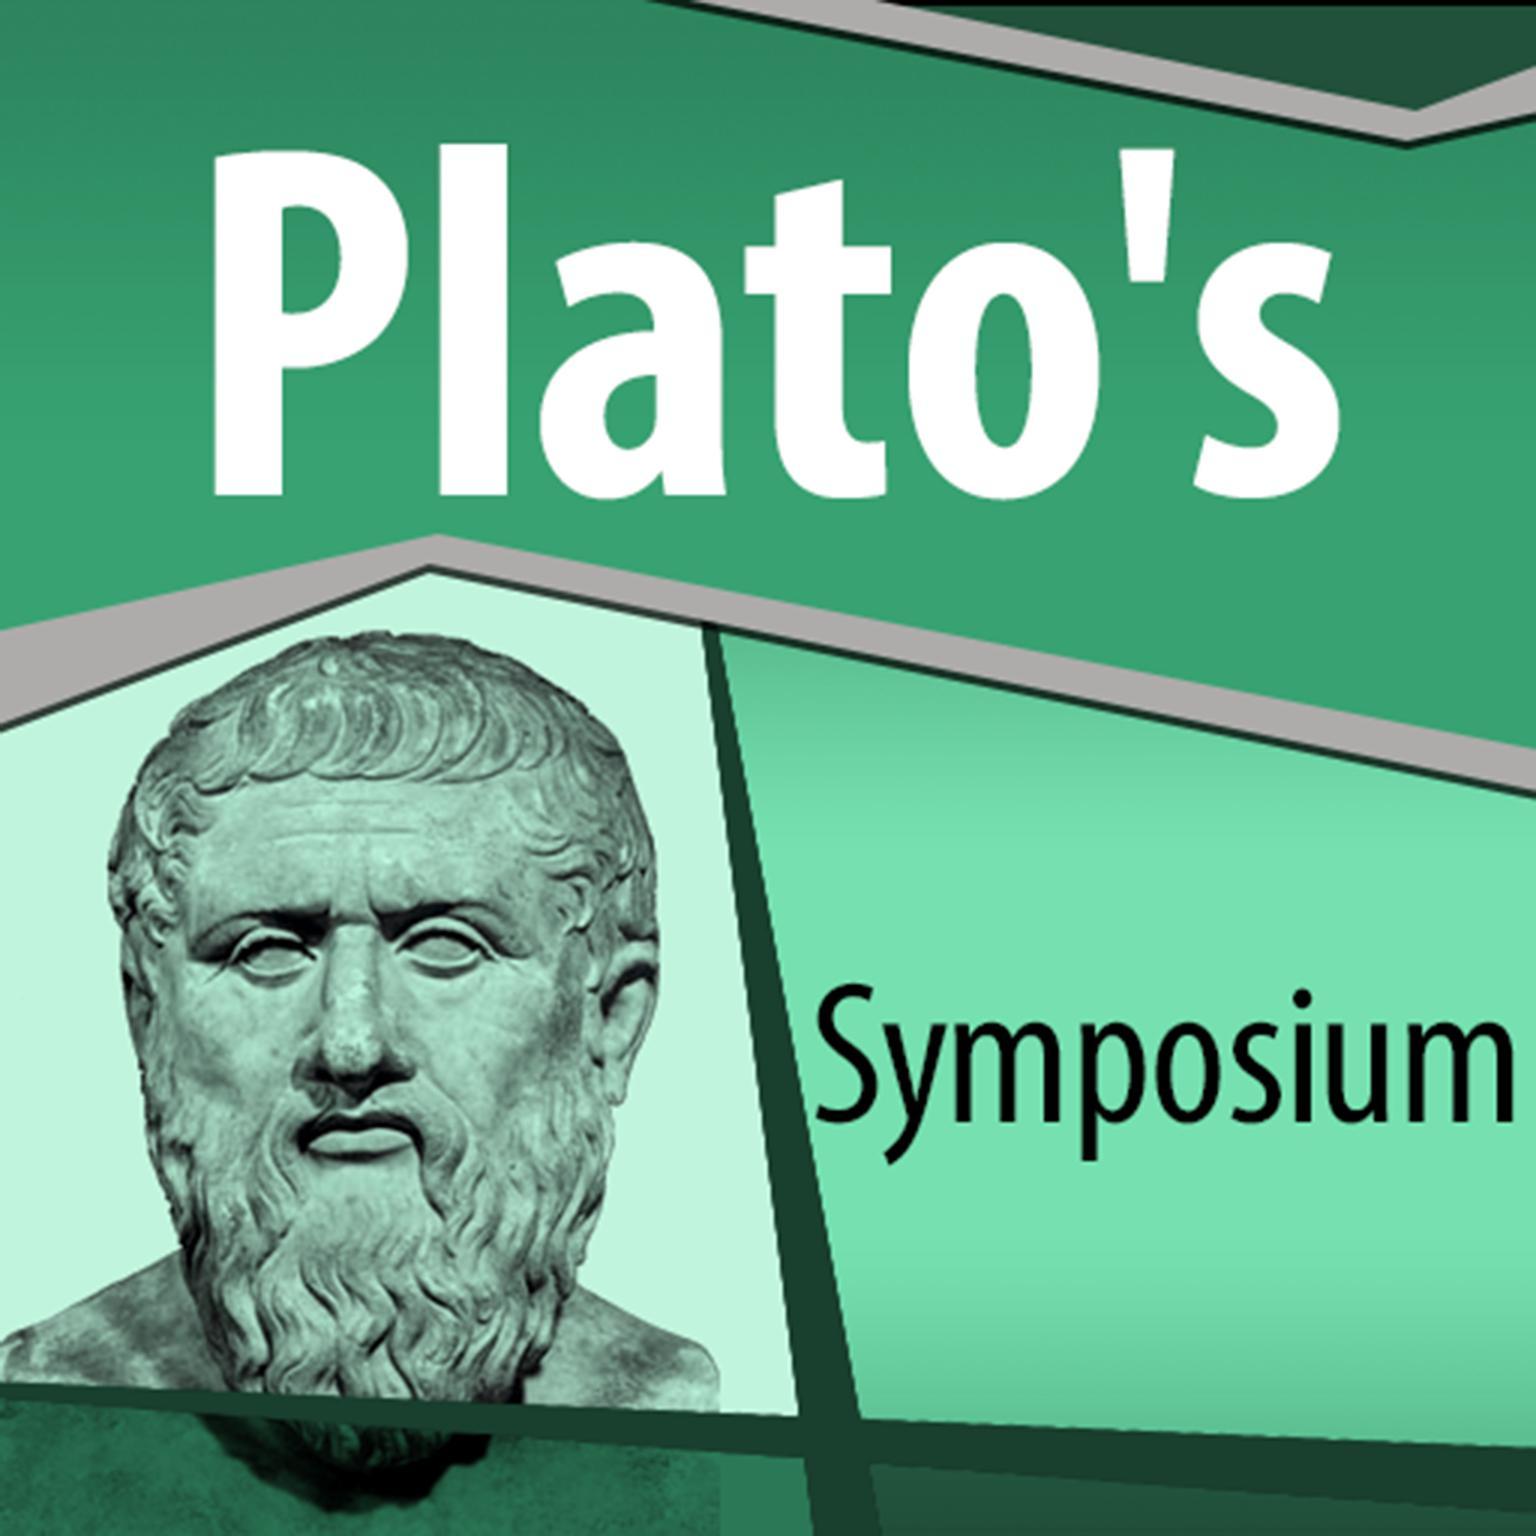 Platos Symposium Audiobook, by Plato